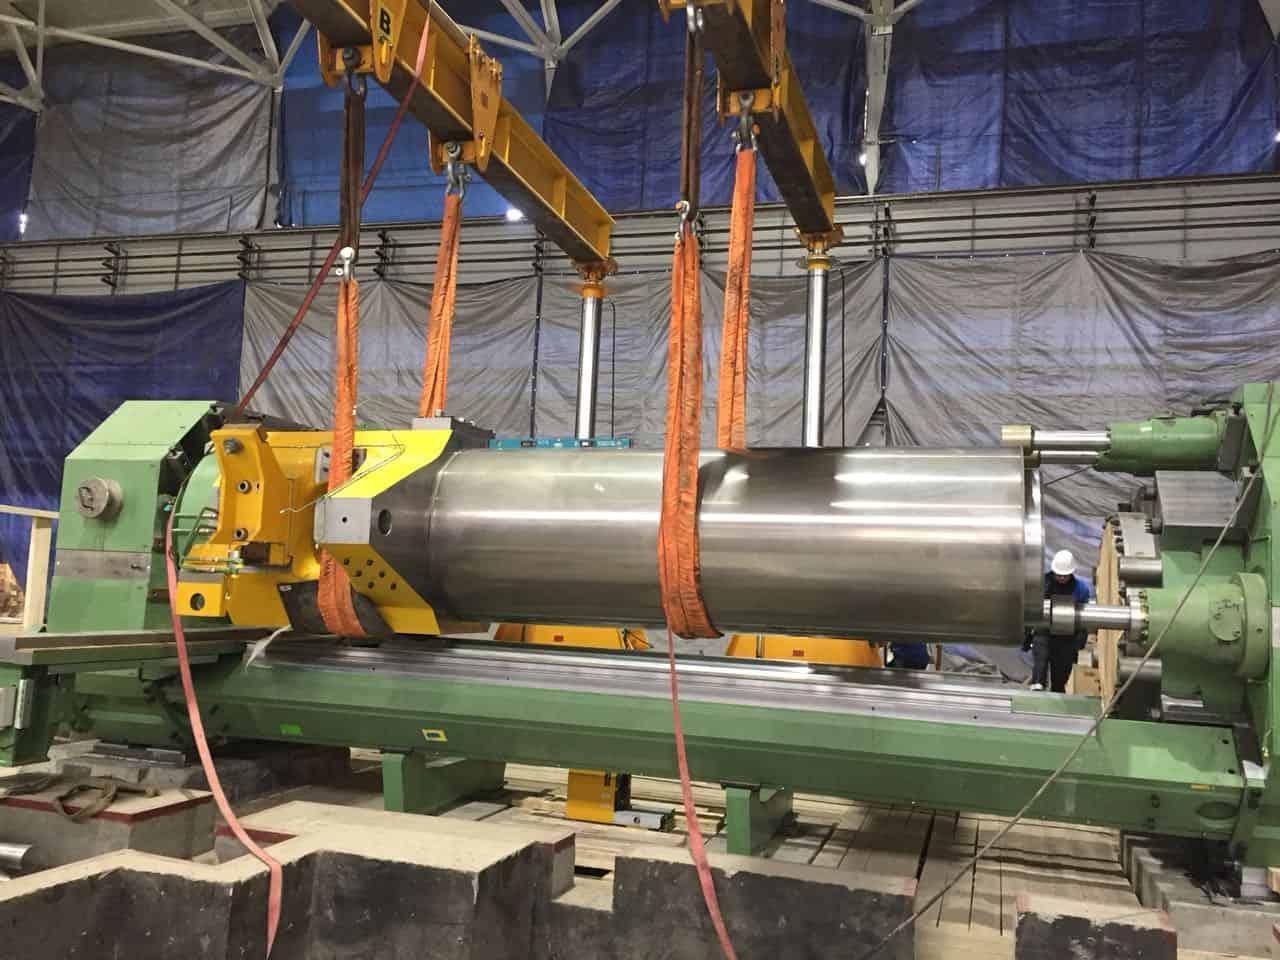 Установка плунжера главного цилиндра пресса 35МН SMS MEER в цехе